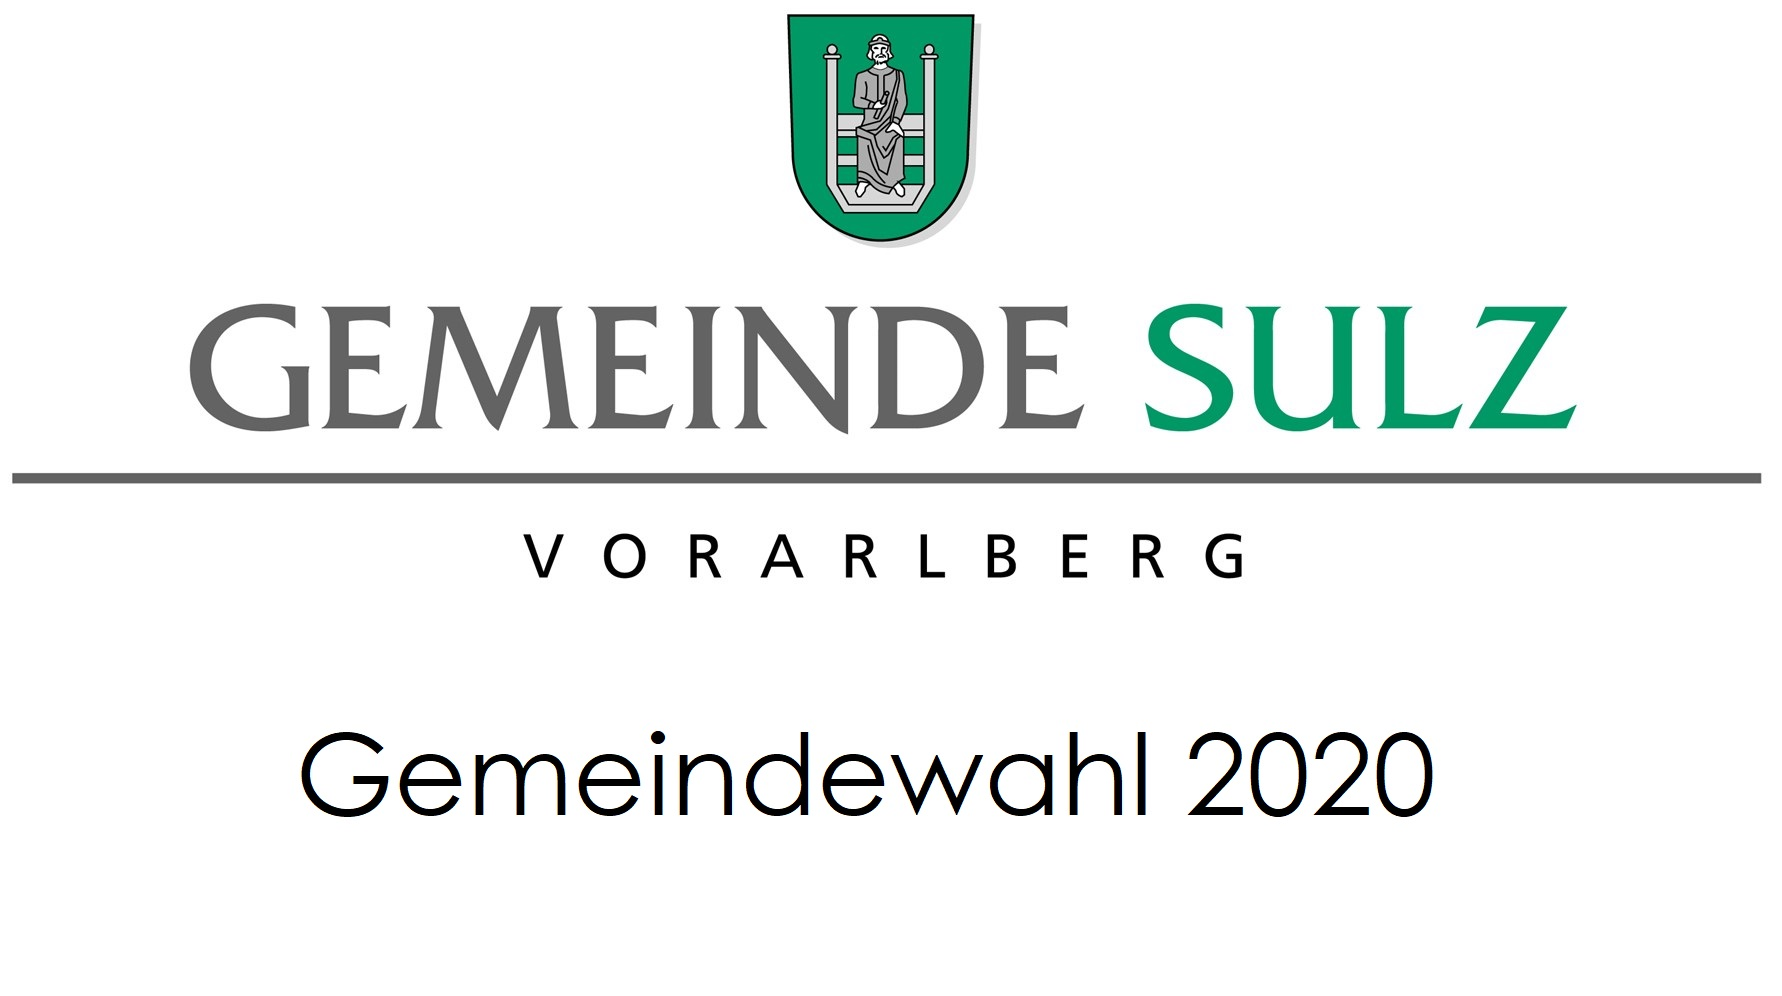 Gemeindewahl 2020 v2.jpg